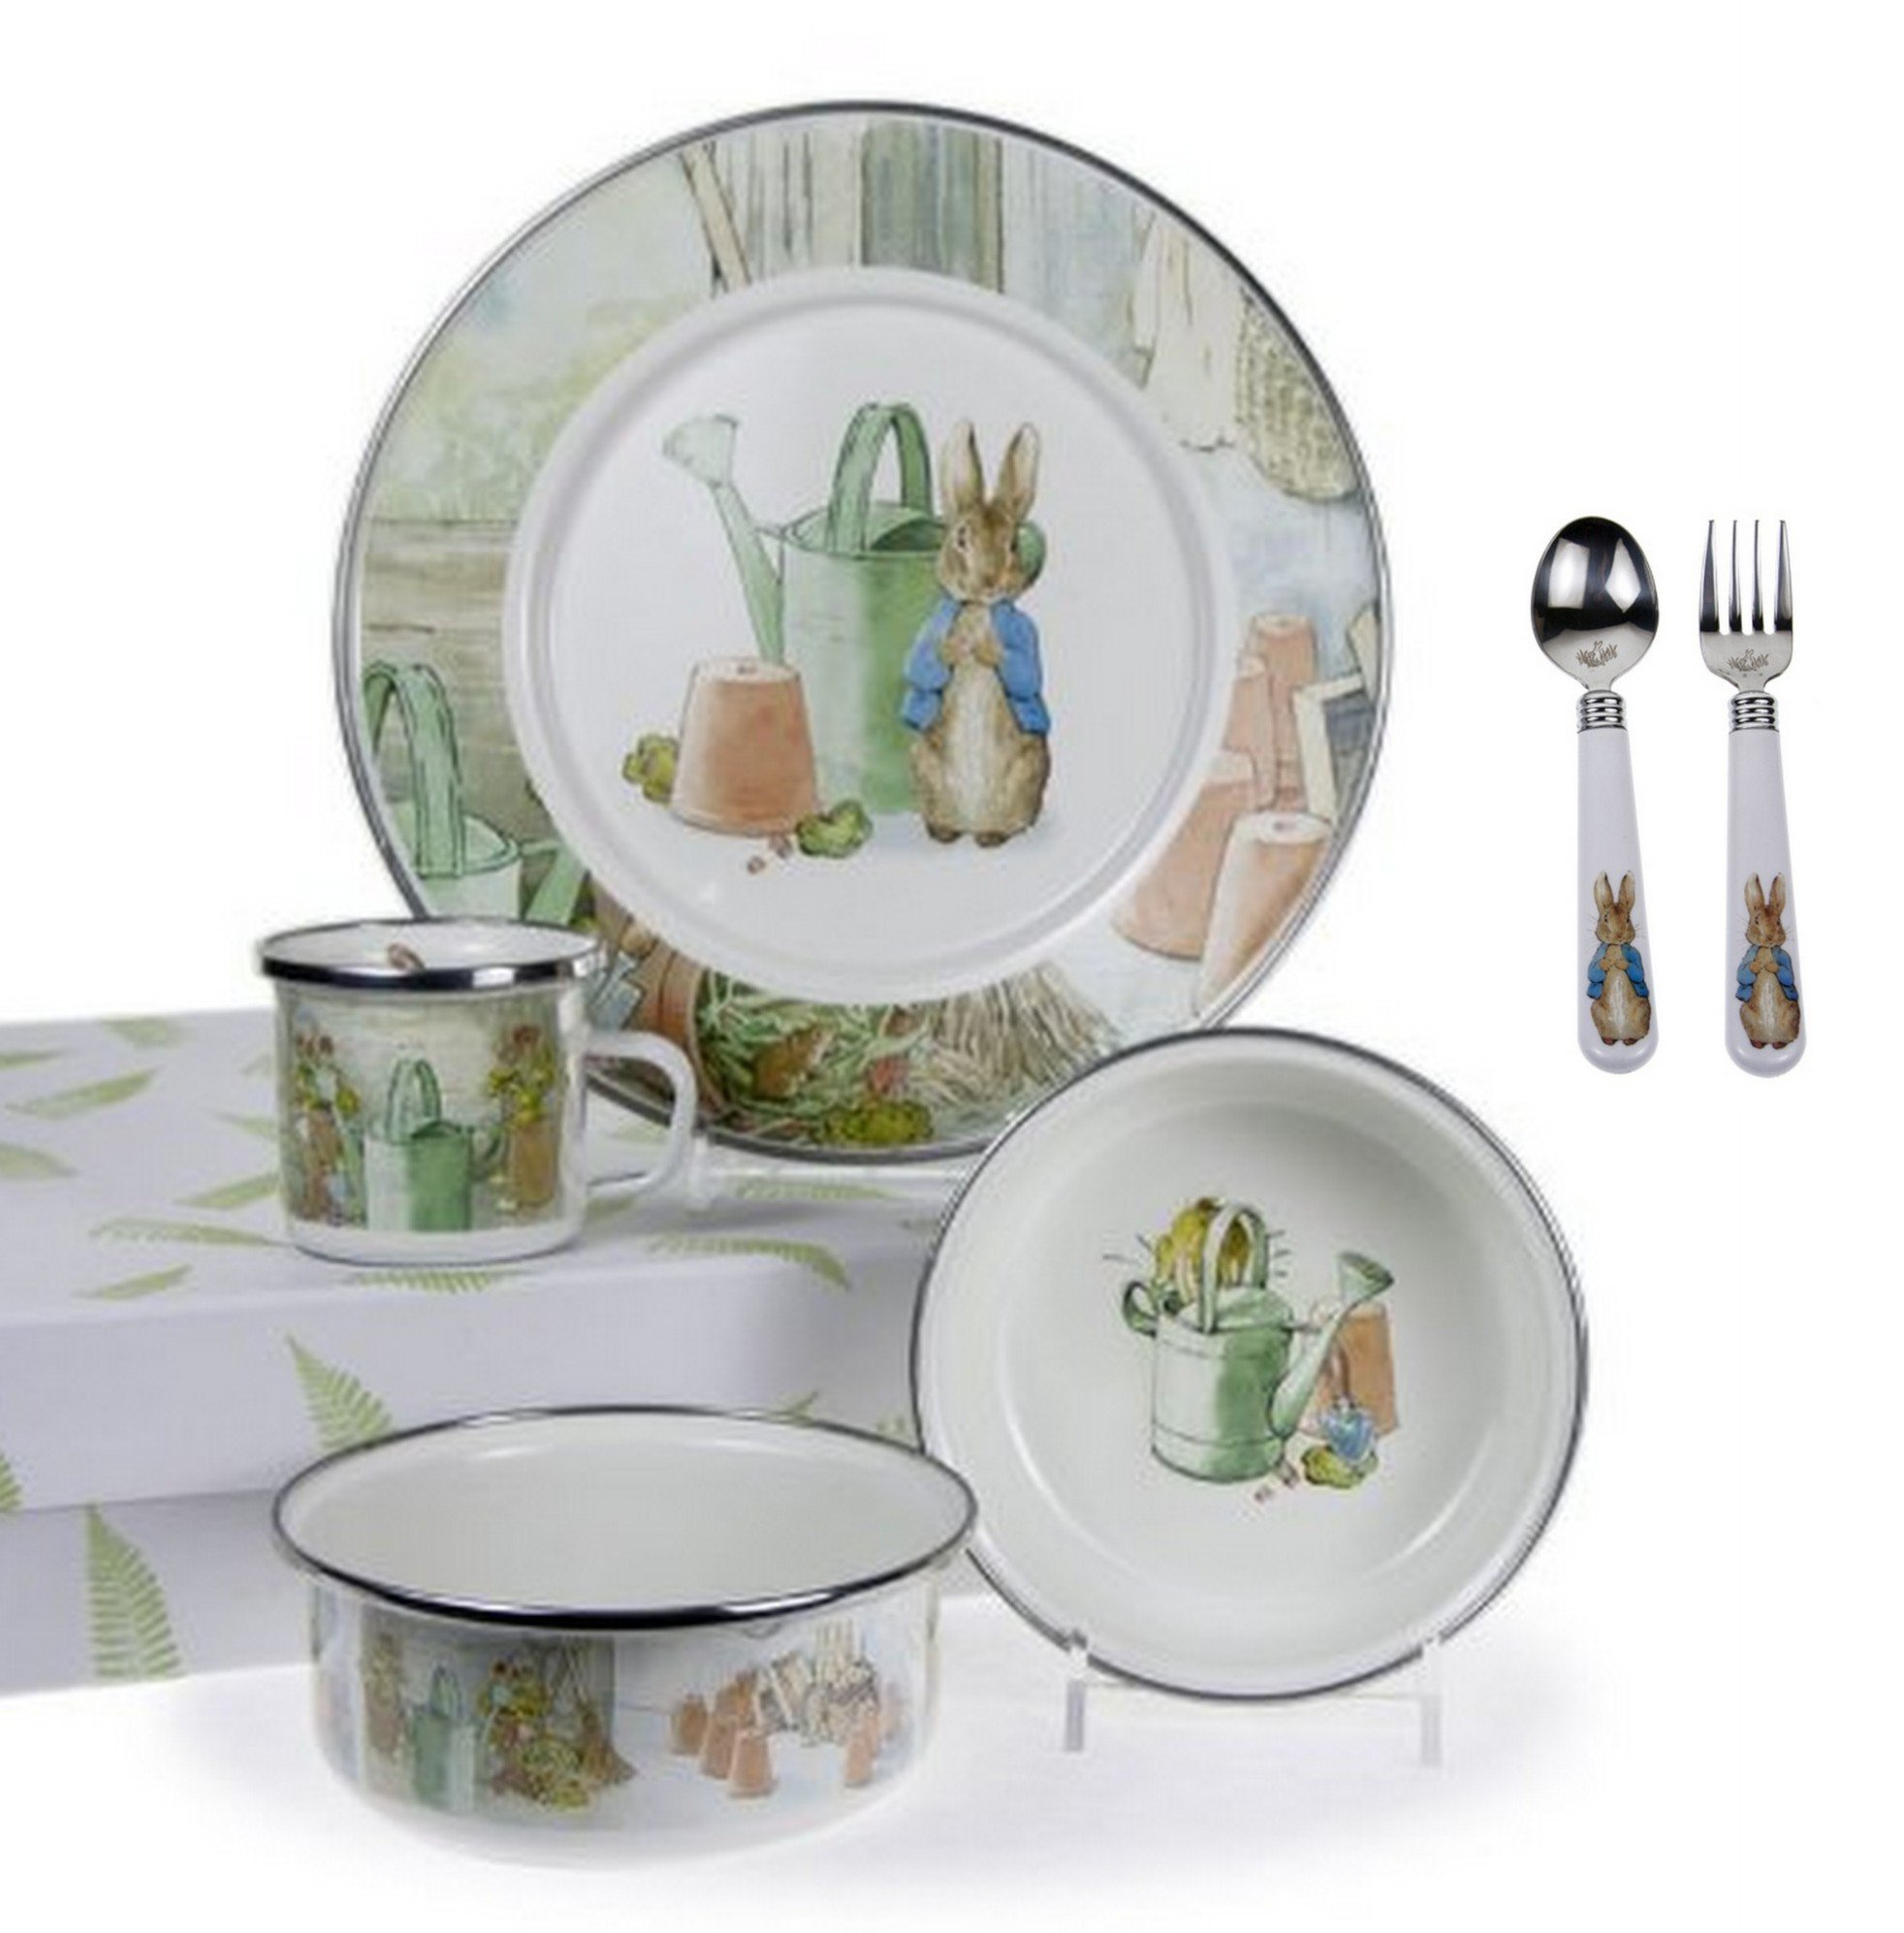 Golden Rabbit, Beatrix Potter's Peter Rabbit 4 Piece Feeding Set, Watering Can Style by Golden Rabbit (Image #1)